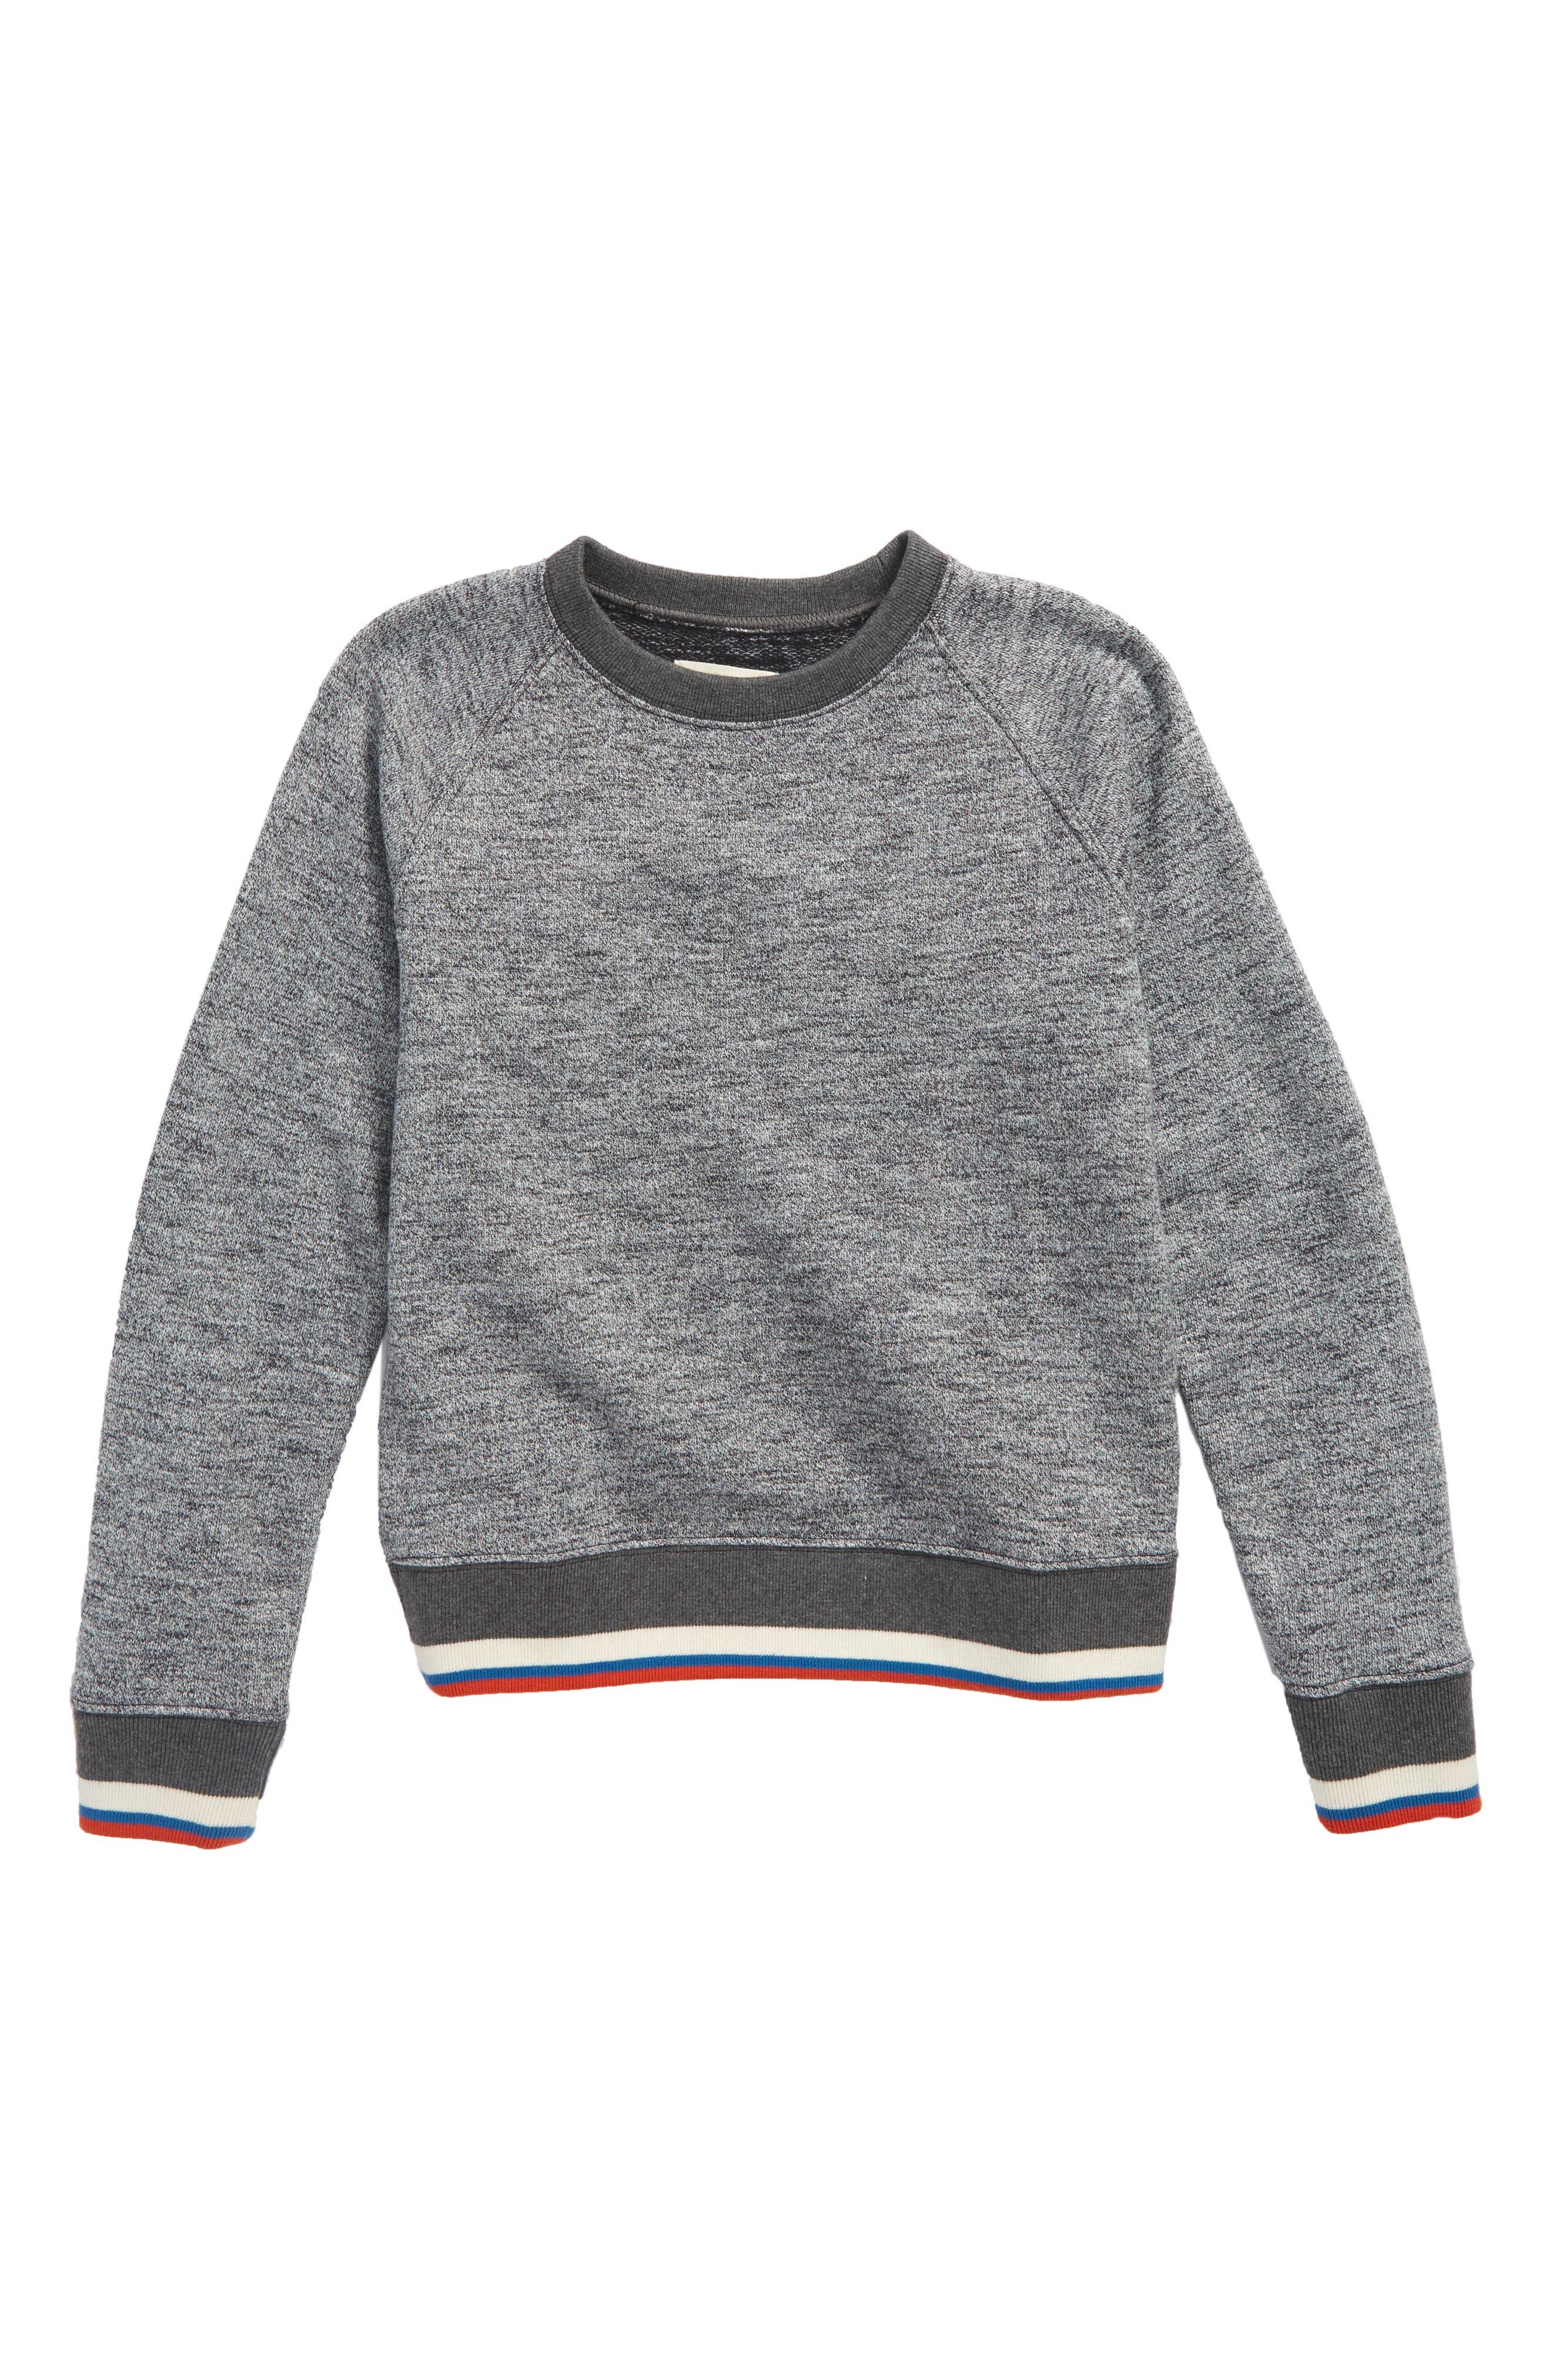 Stripe Crewneck Sweatshirt,                             Main thumbnail 1, color,                             Grey Alloy